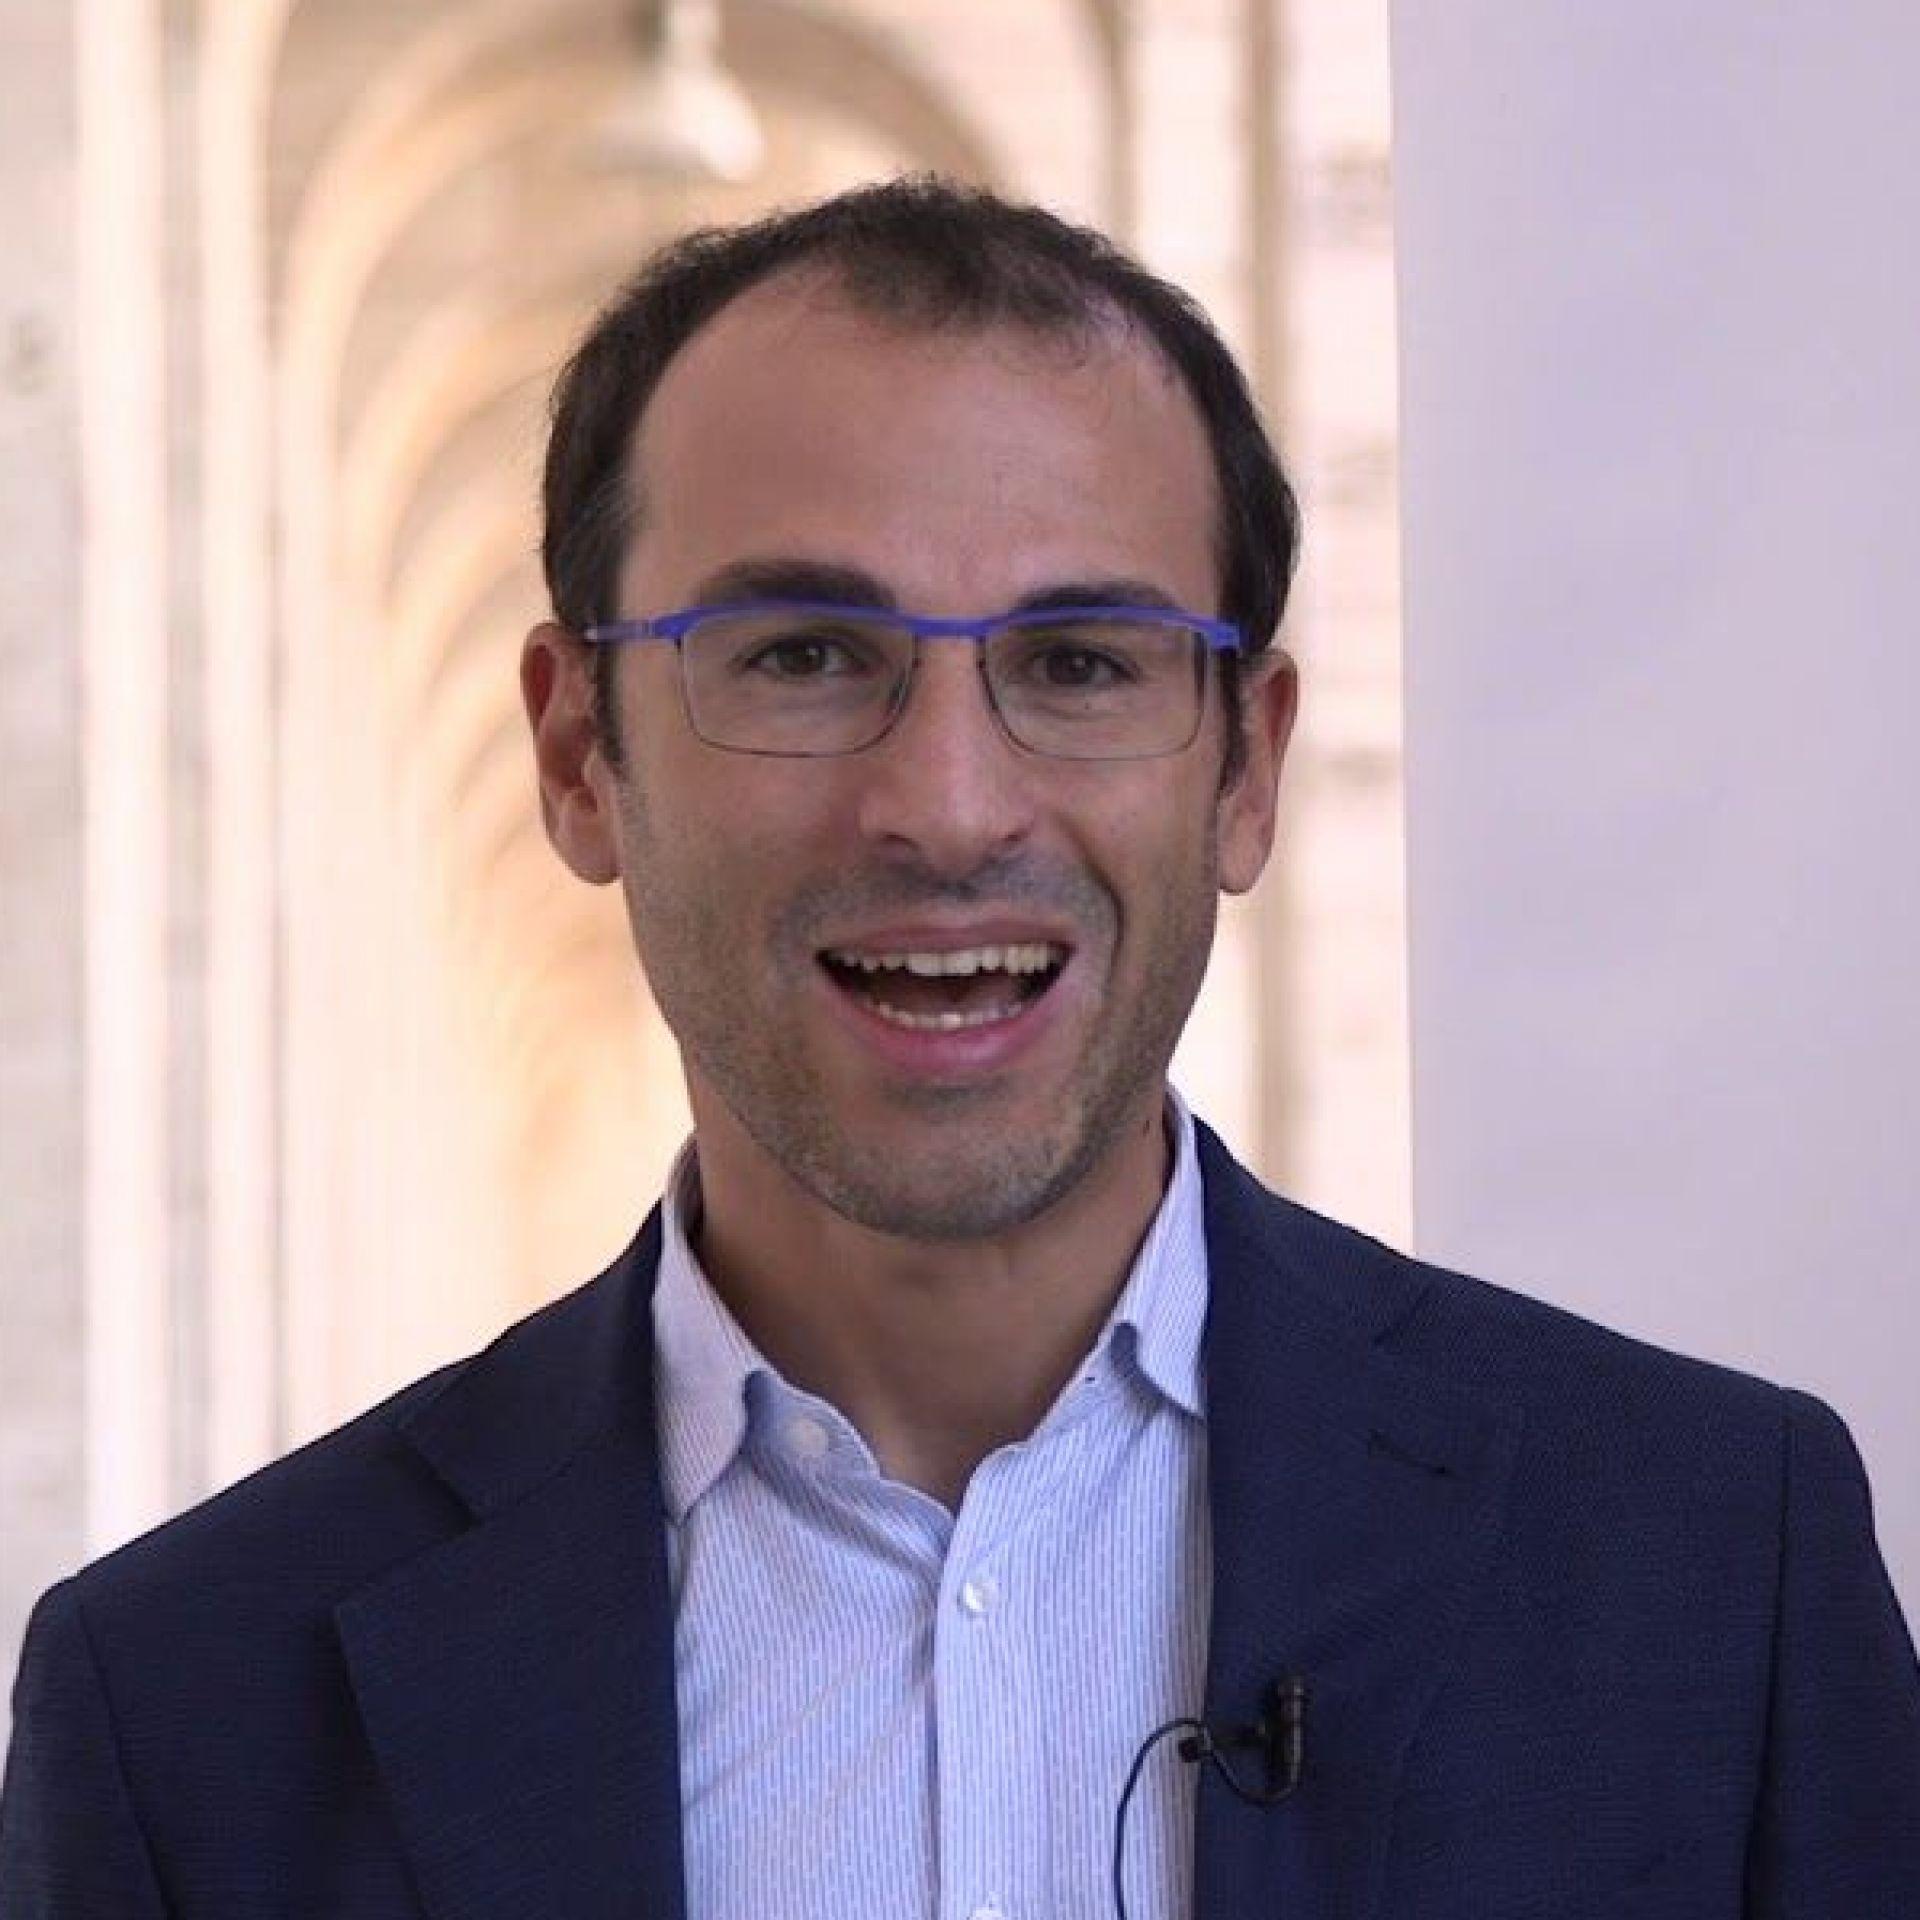 Niccolò Sanarico